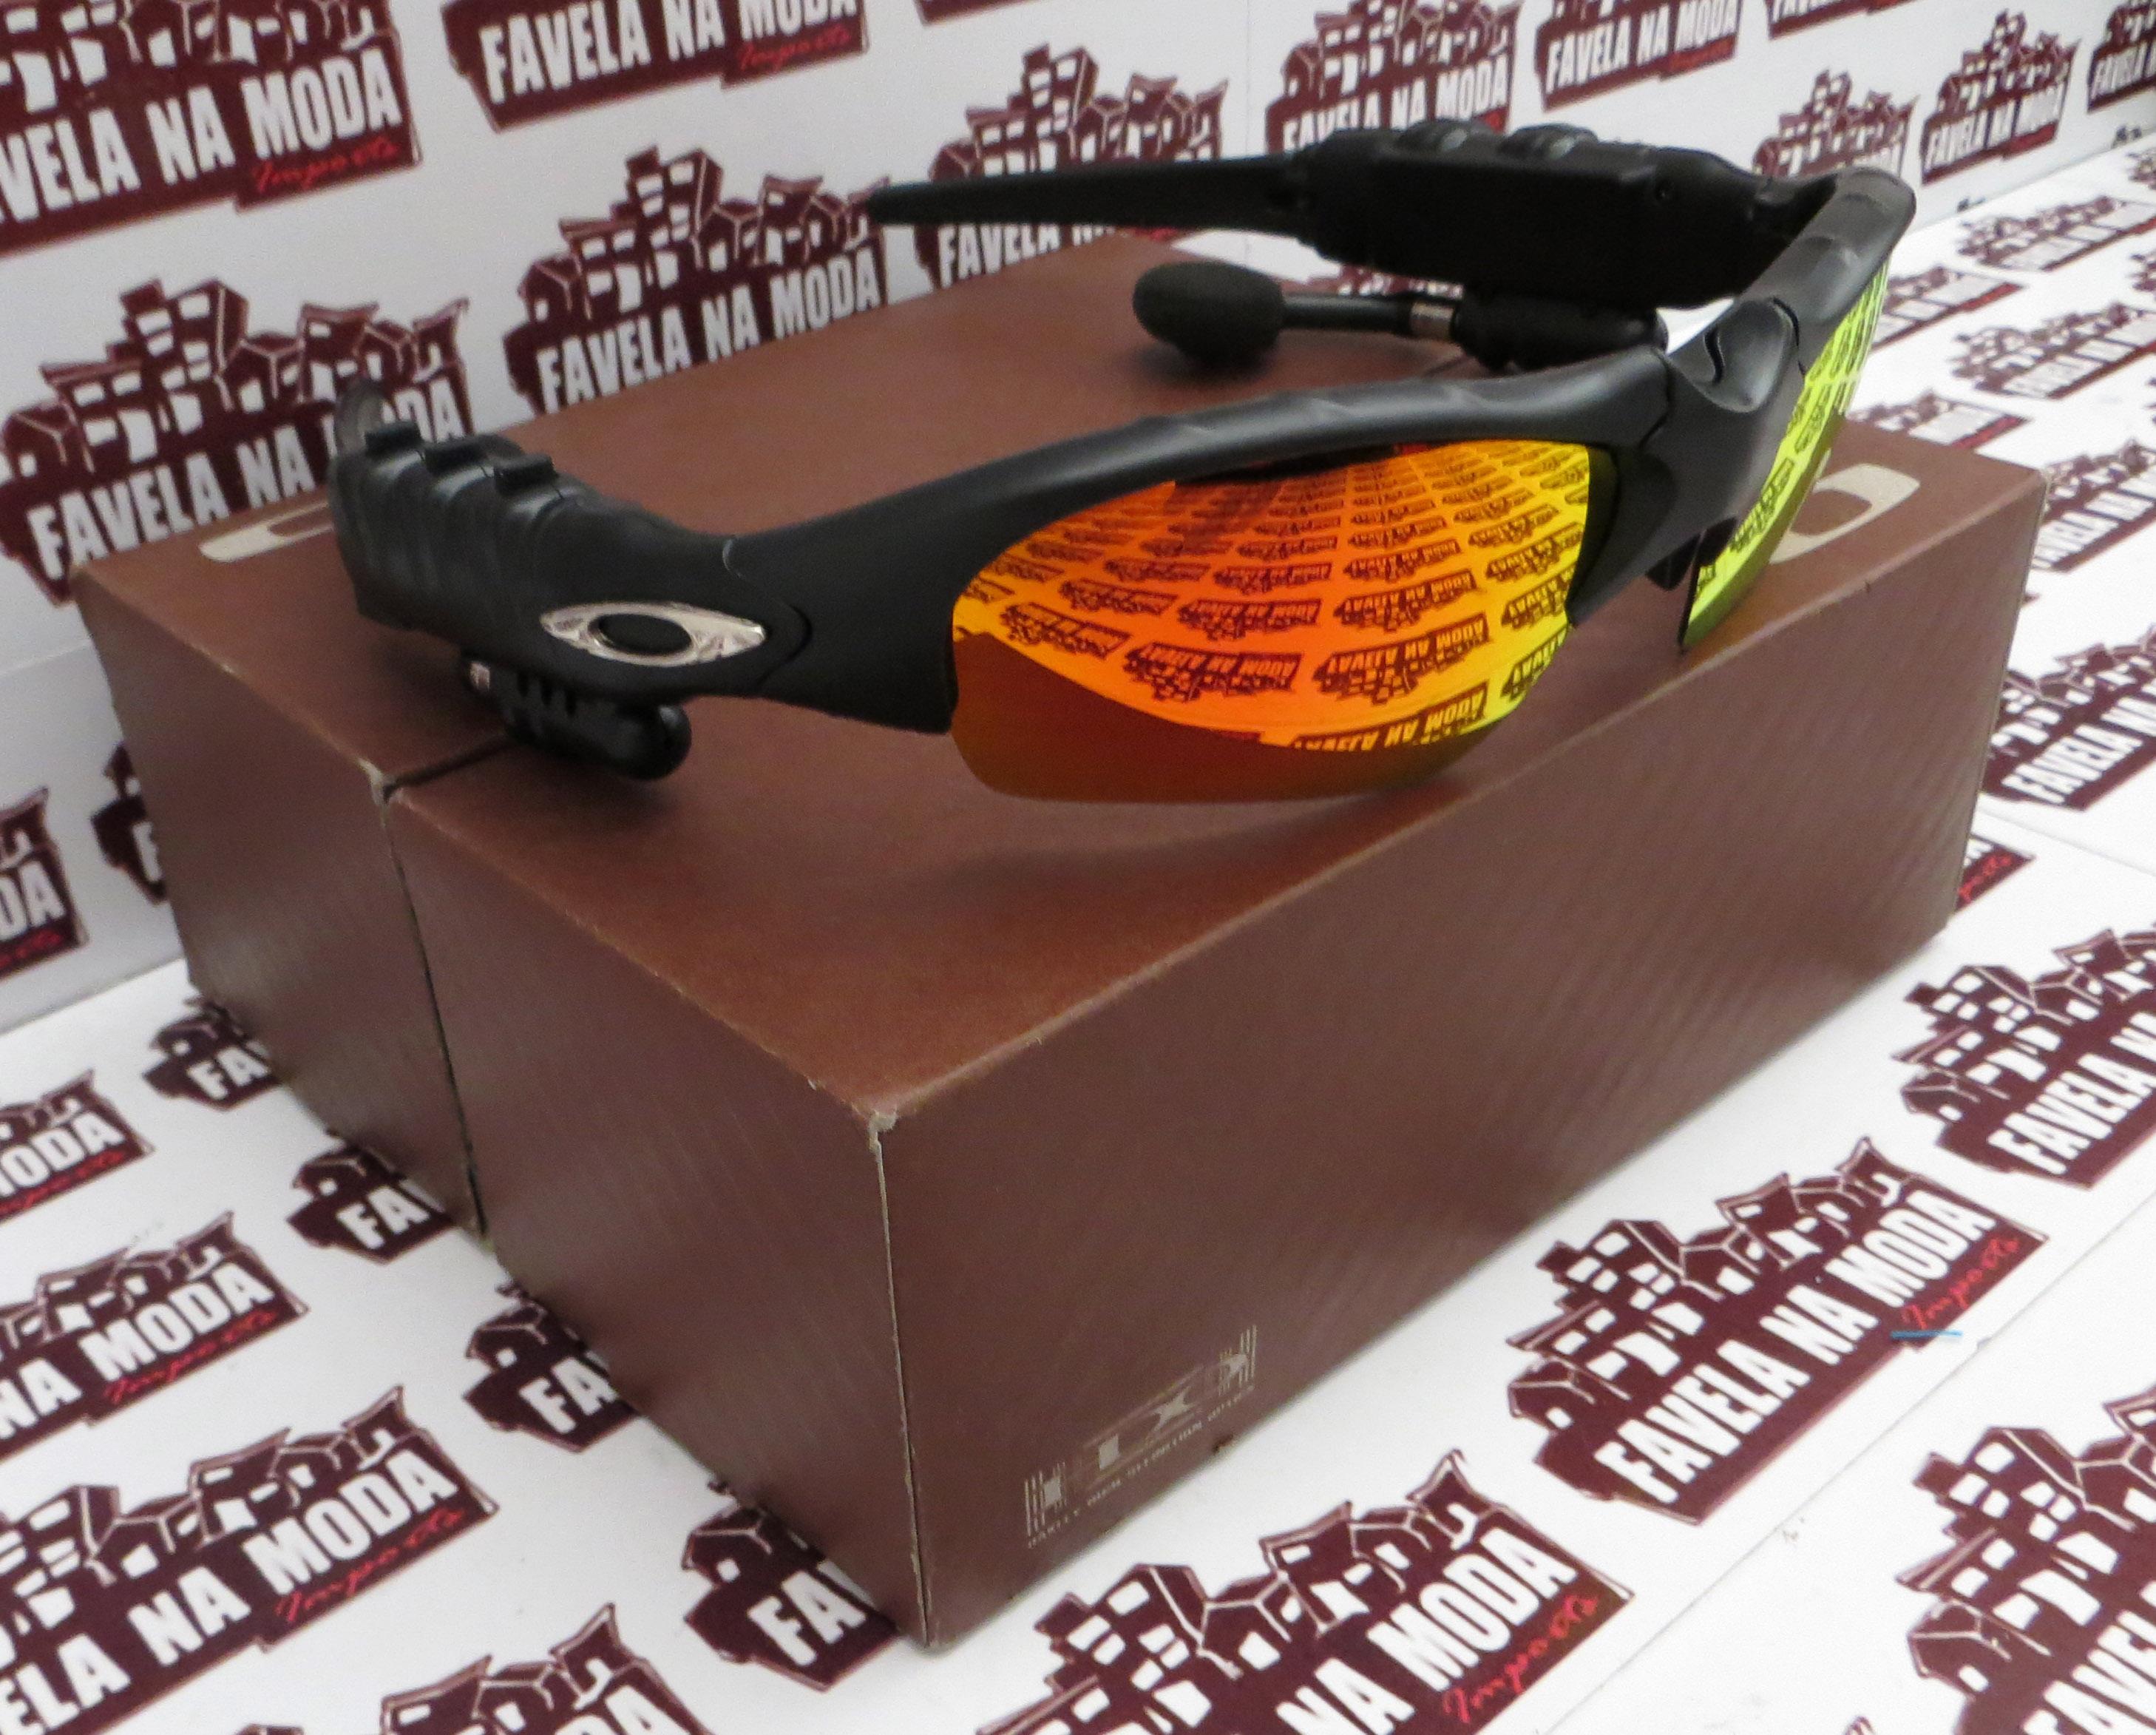 30a6ba73c Óculos Oakley Thump - Black / Dark Ruby - Favela na Moda Imports